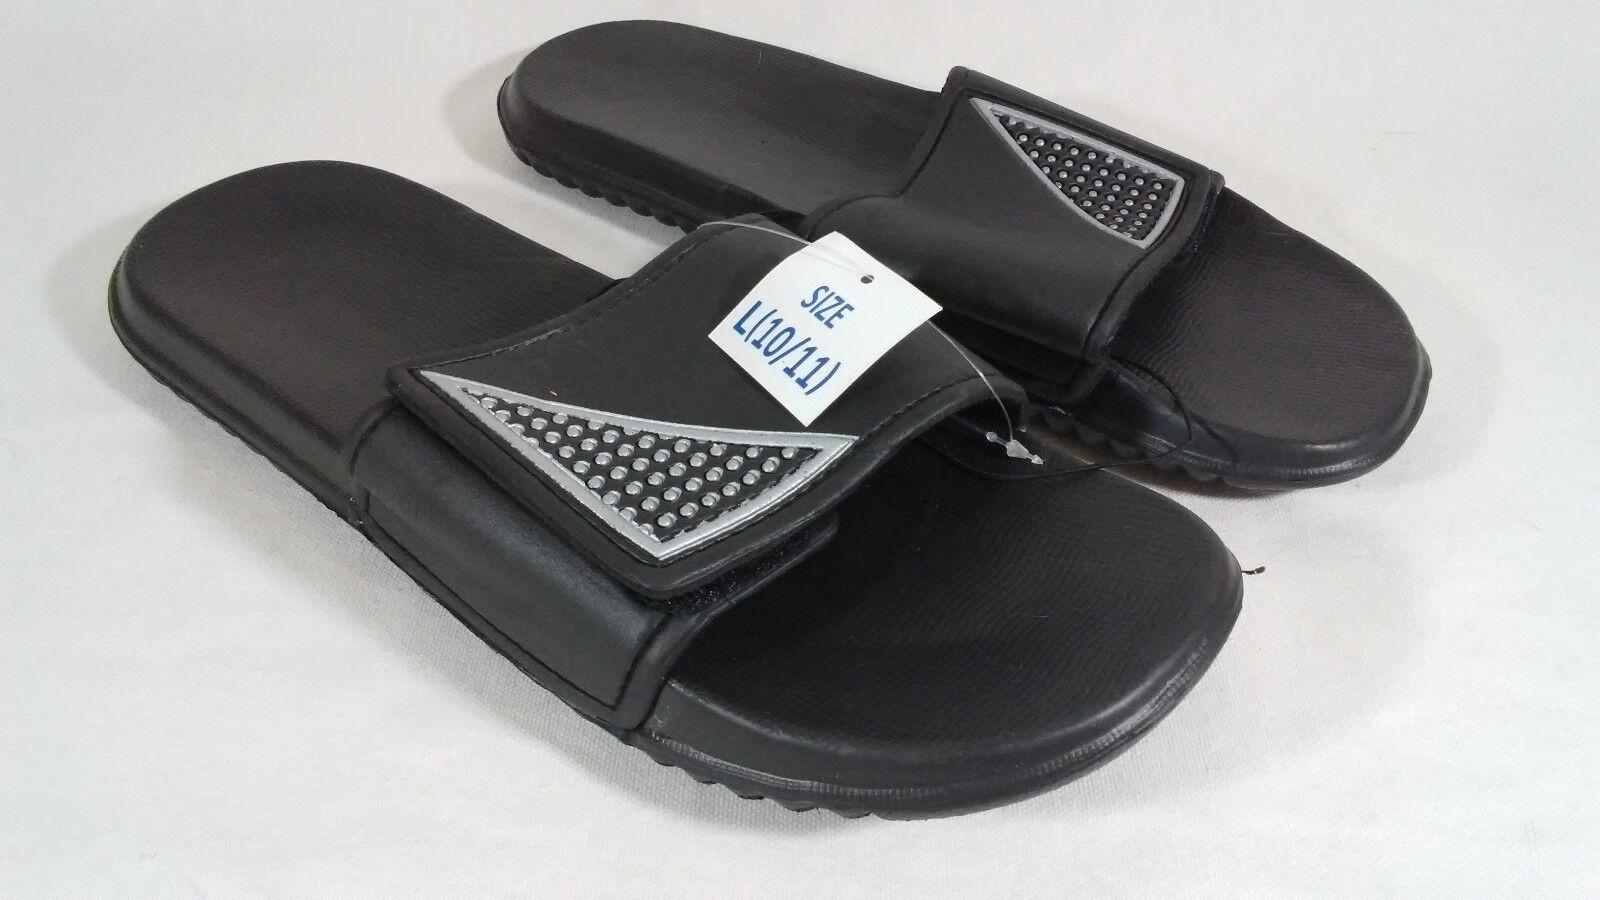 Slip On Shoes Sport Sandals Slide on Shoes On Flip-Flops Shower Slipper Large 10/11 5127 3adb8b